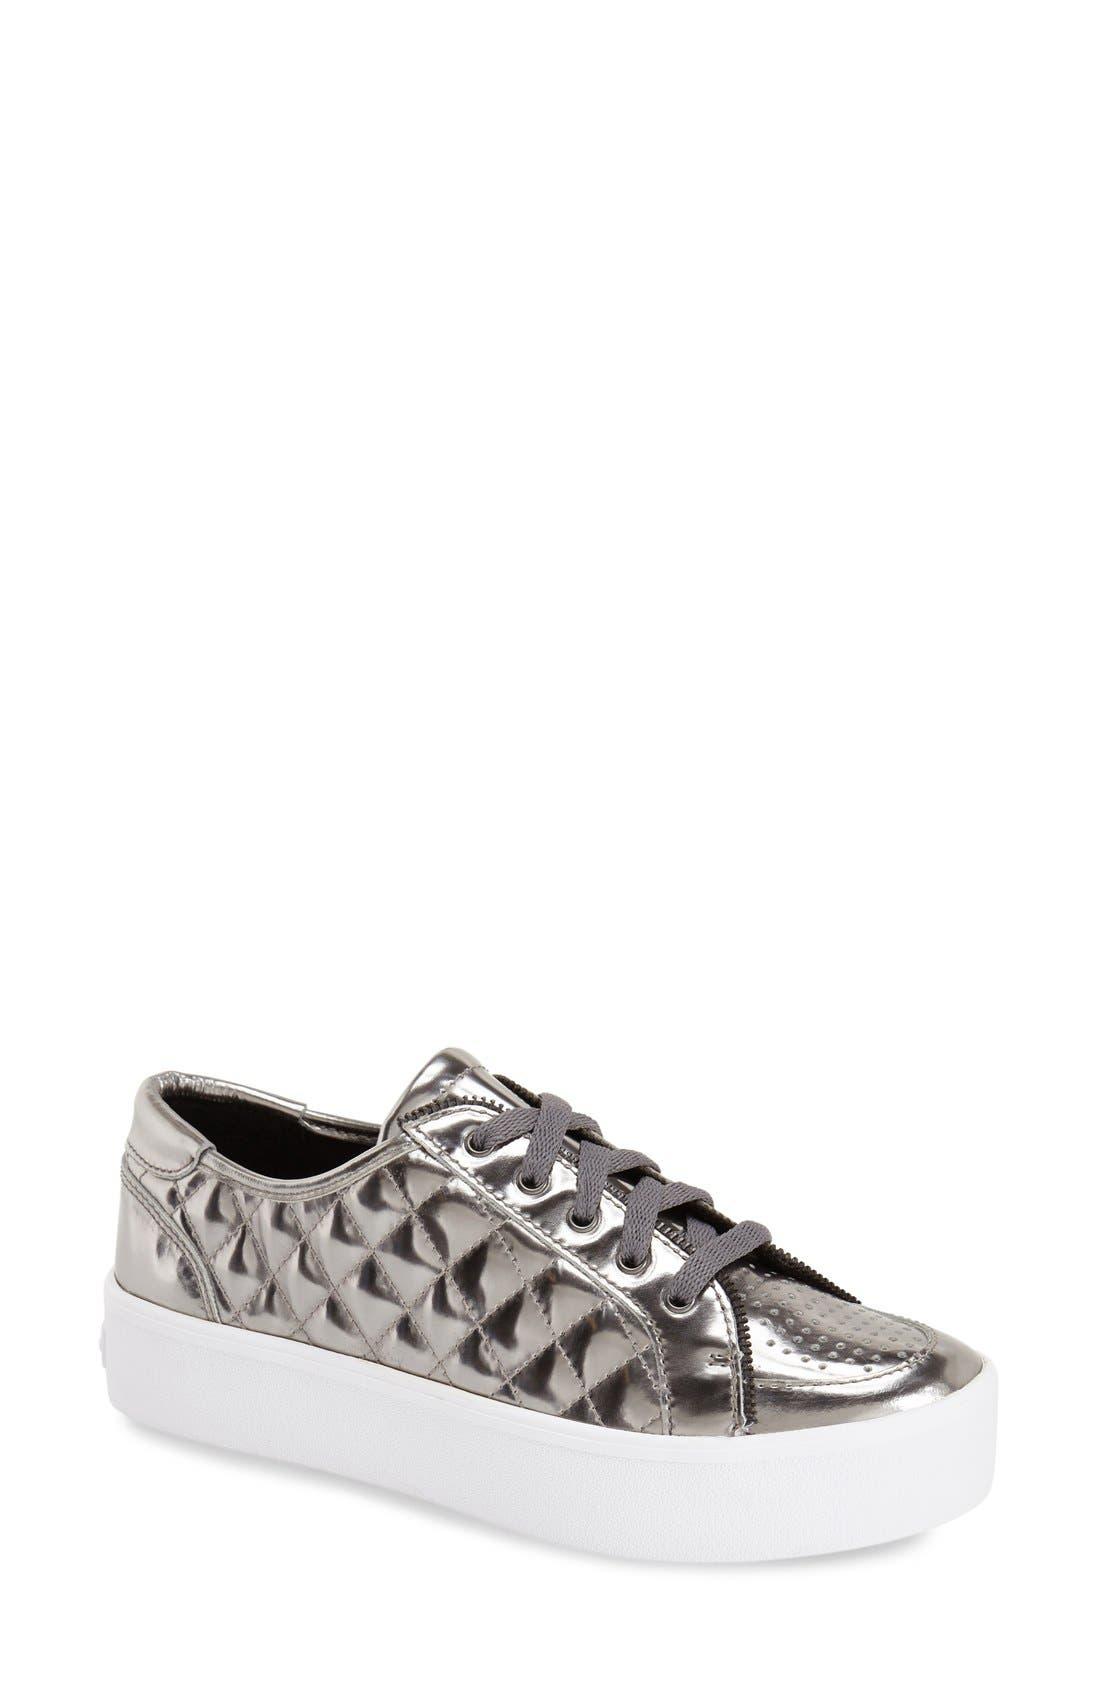 Alternate Image 1 Selected - Rebecca Minkoff 'Sandra' Platform Sneaker (Women)